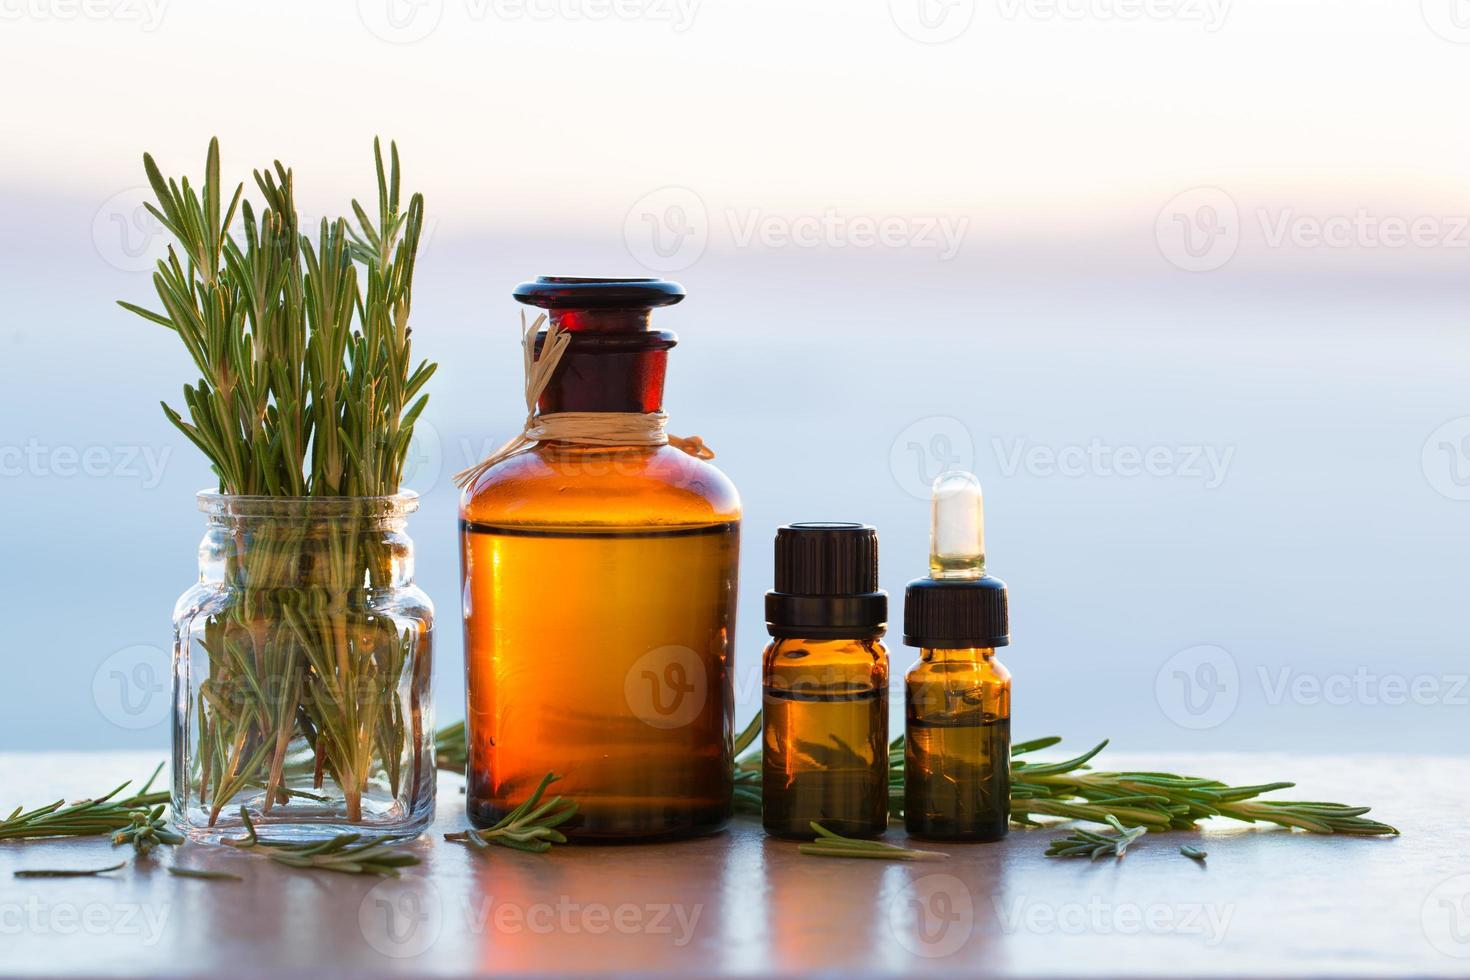 rosmarin aromaterapi eteriska oljor i flaskor foto